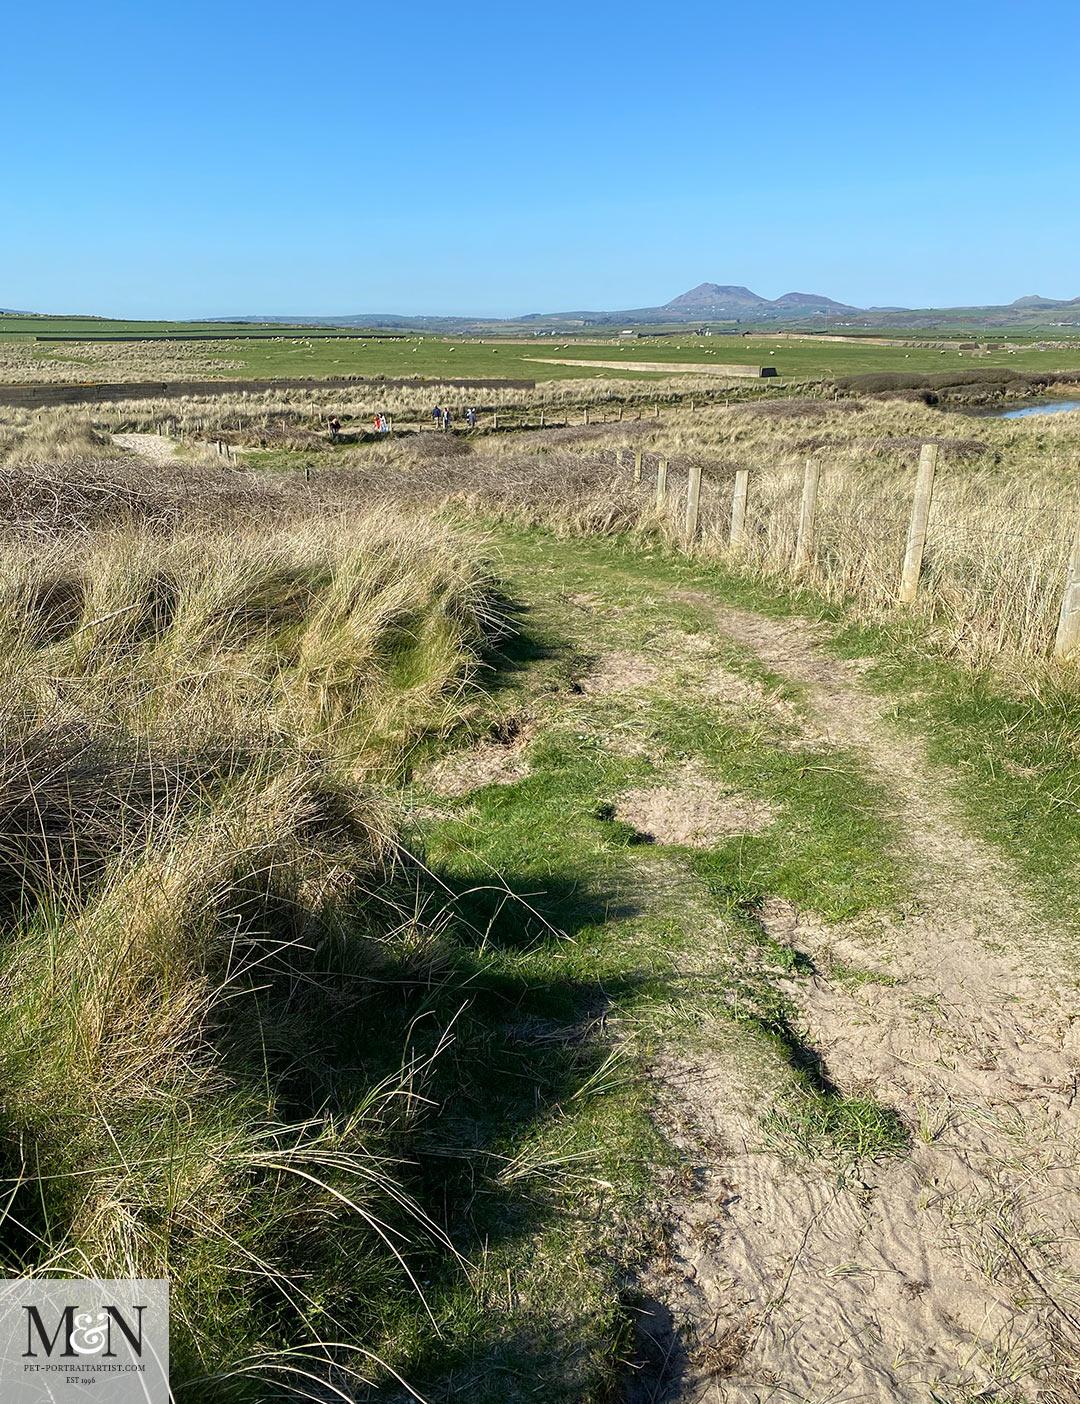 Melanie's April Monthly News - Coastal path views